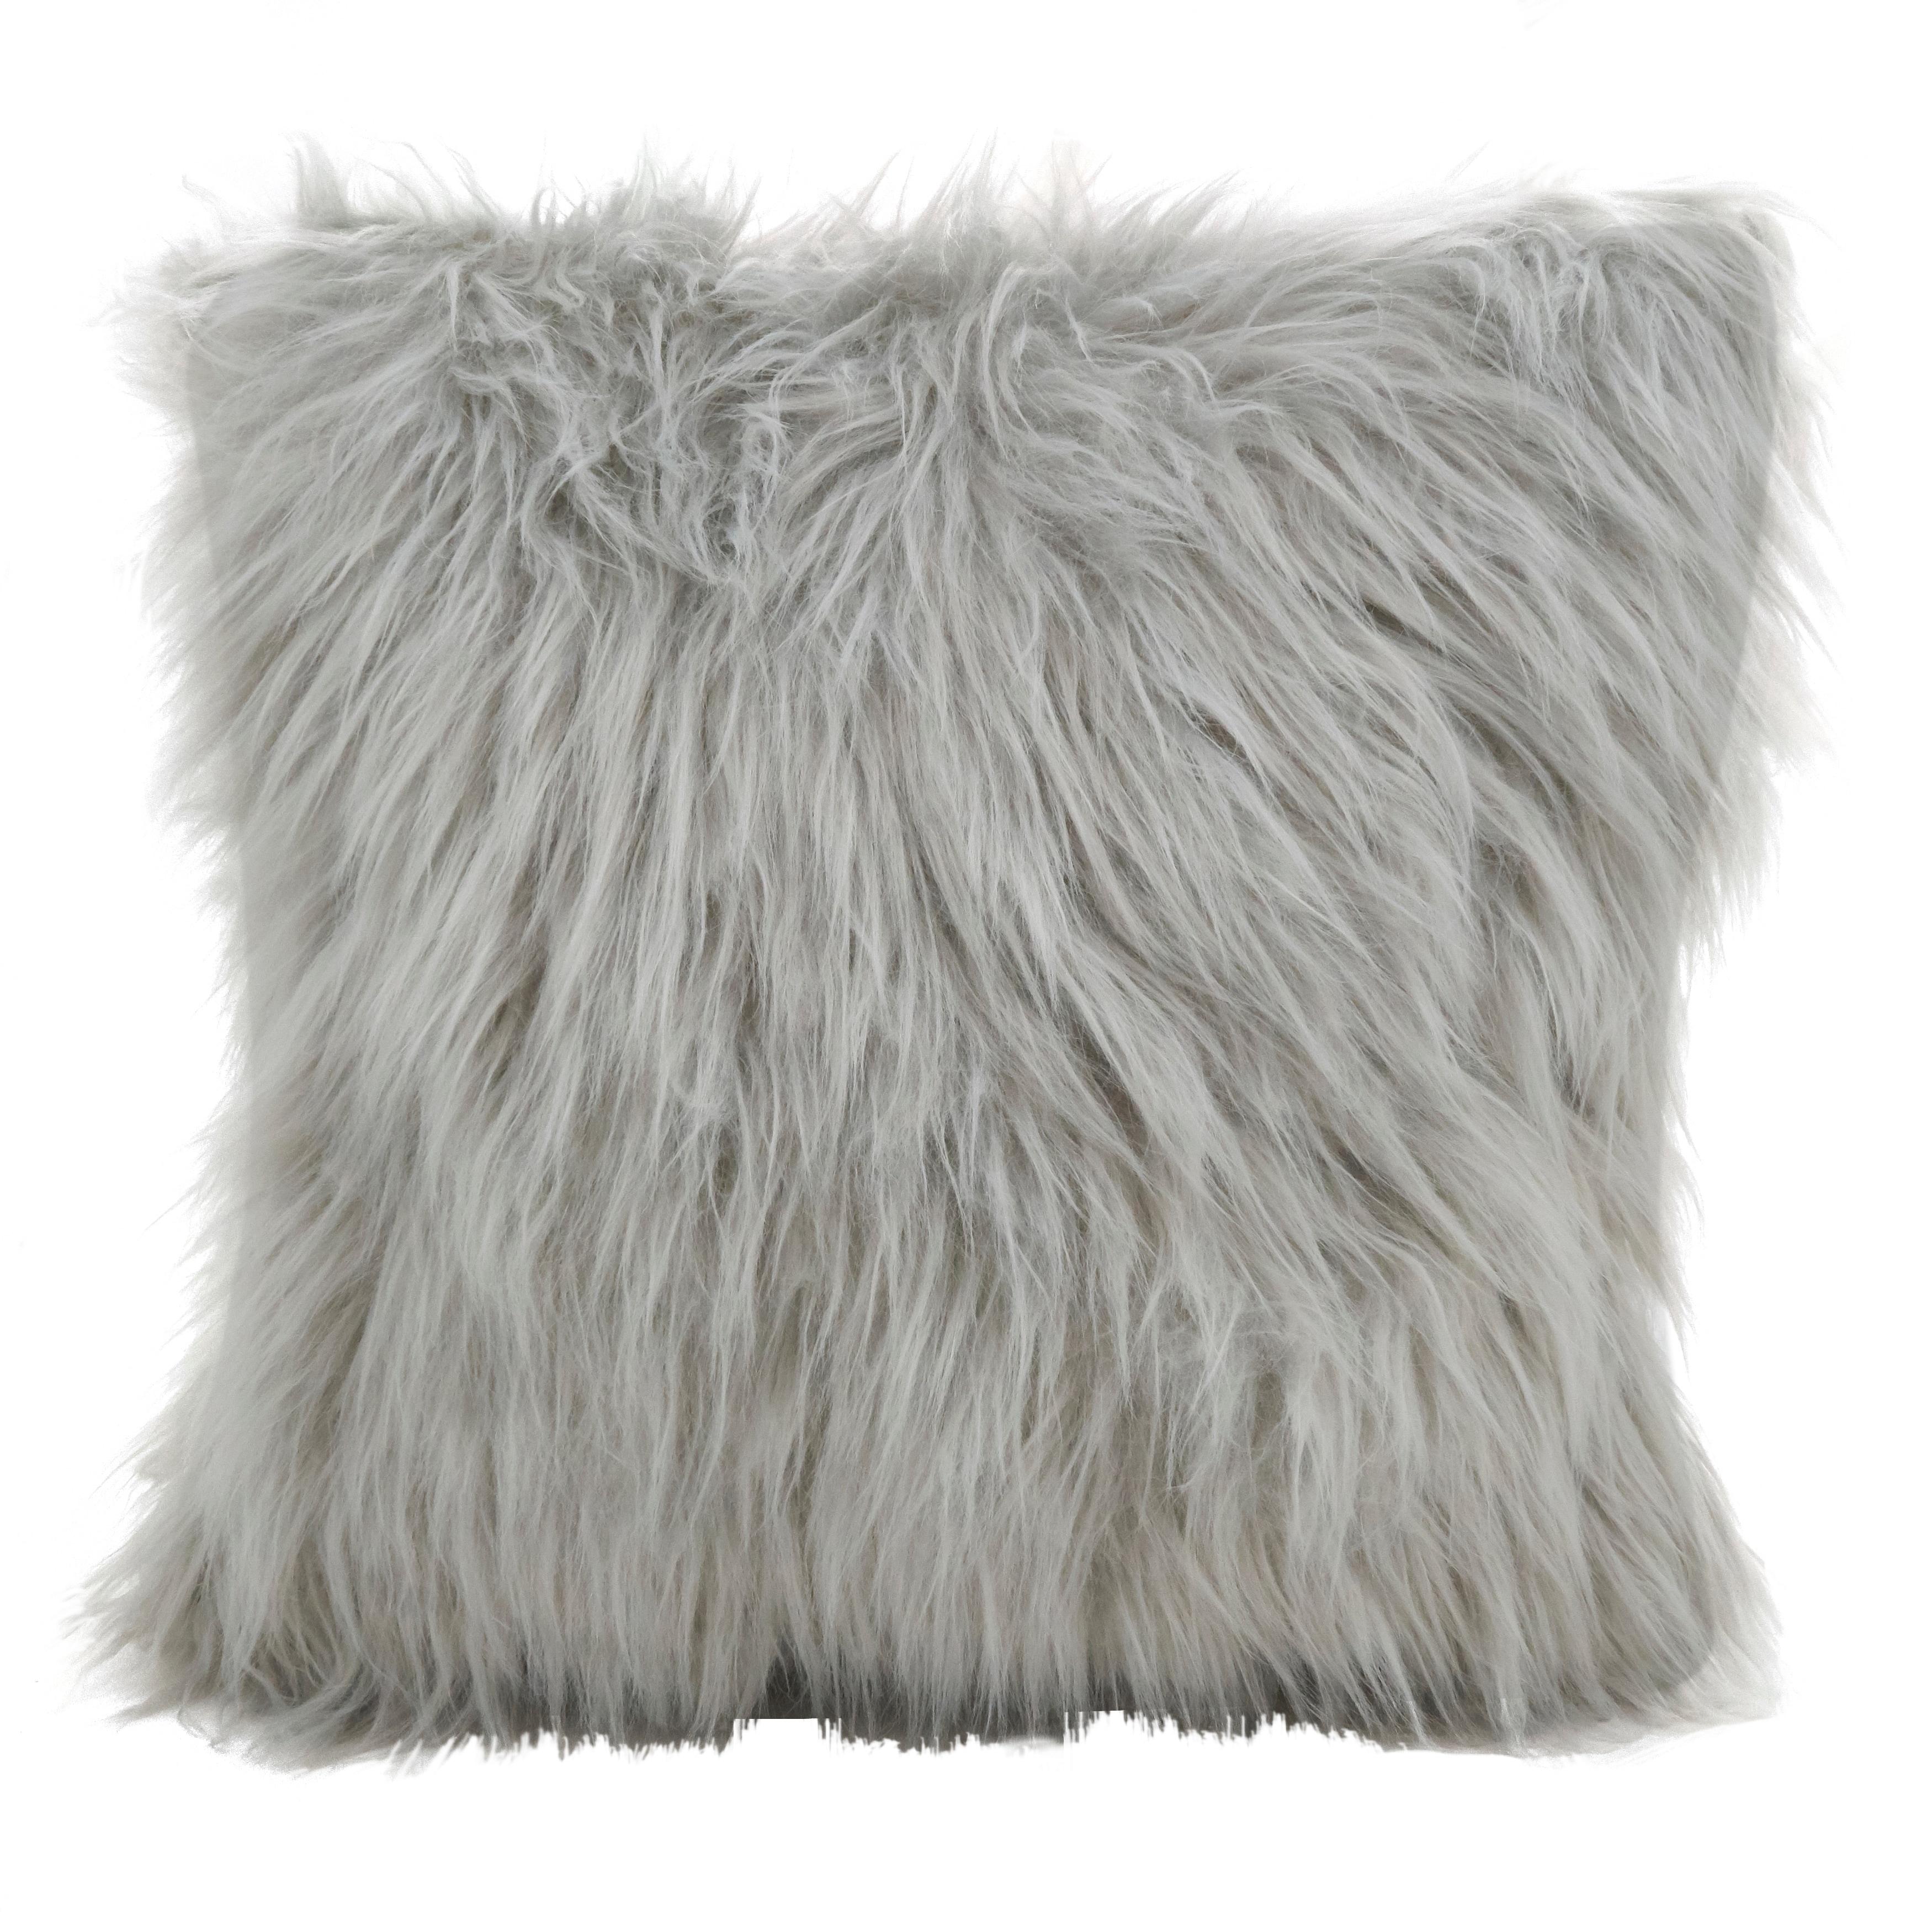 product usa pillow pillows moe lamb throws grey xu products s large wholesale fur